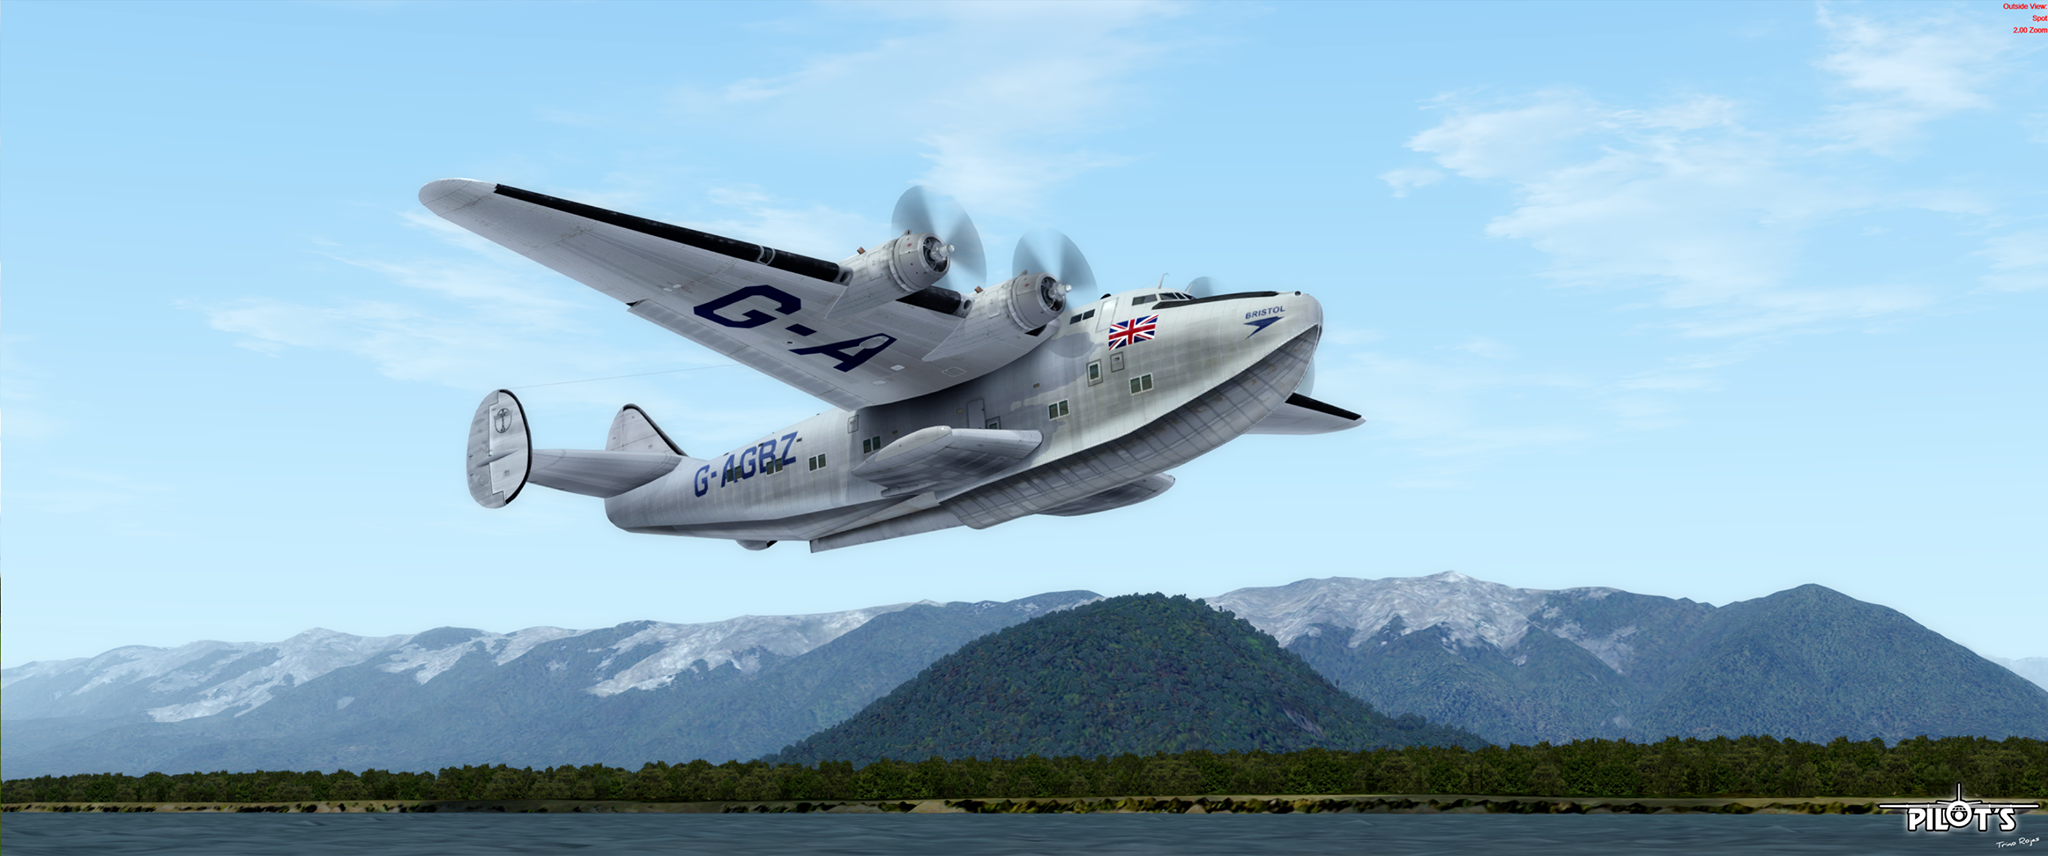 Boeing Clipper Pilots 8